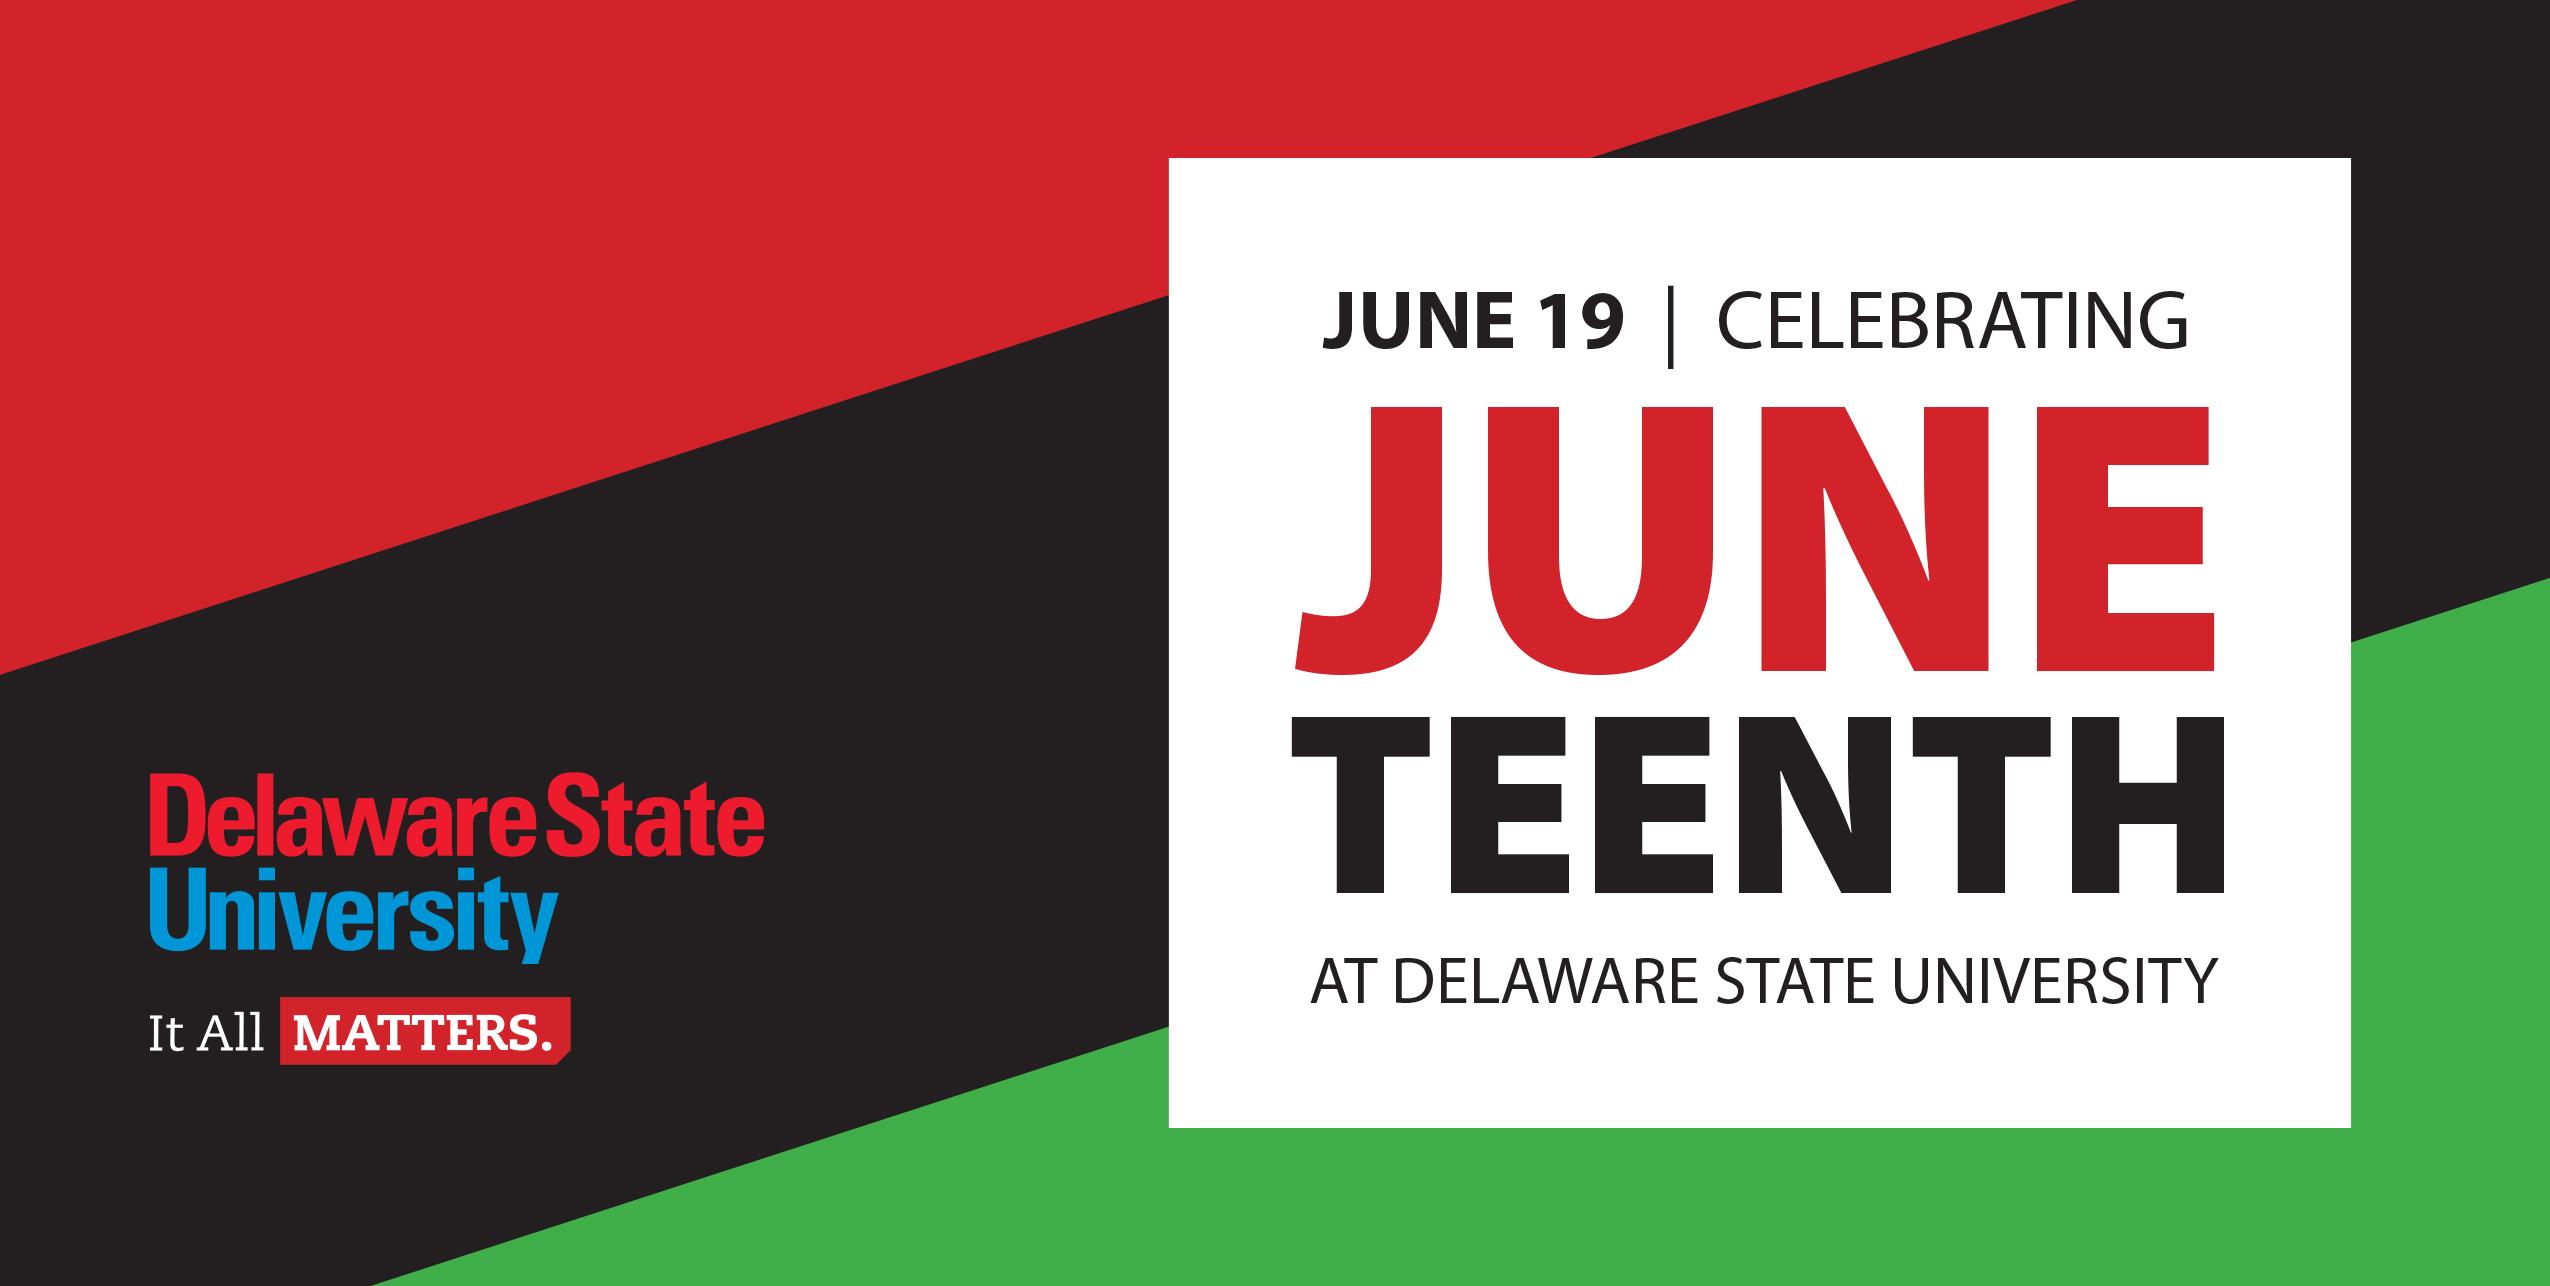 University's Observance of Juneteenth on June 19